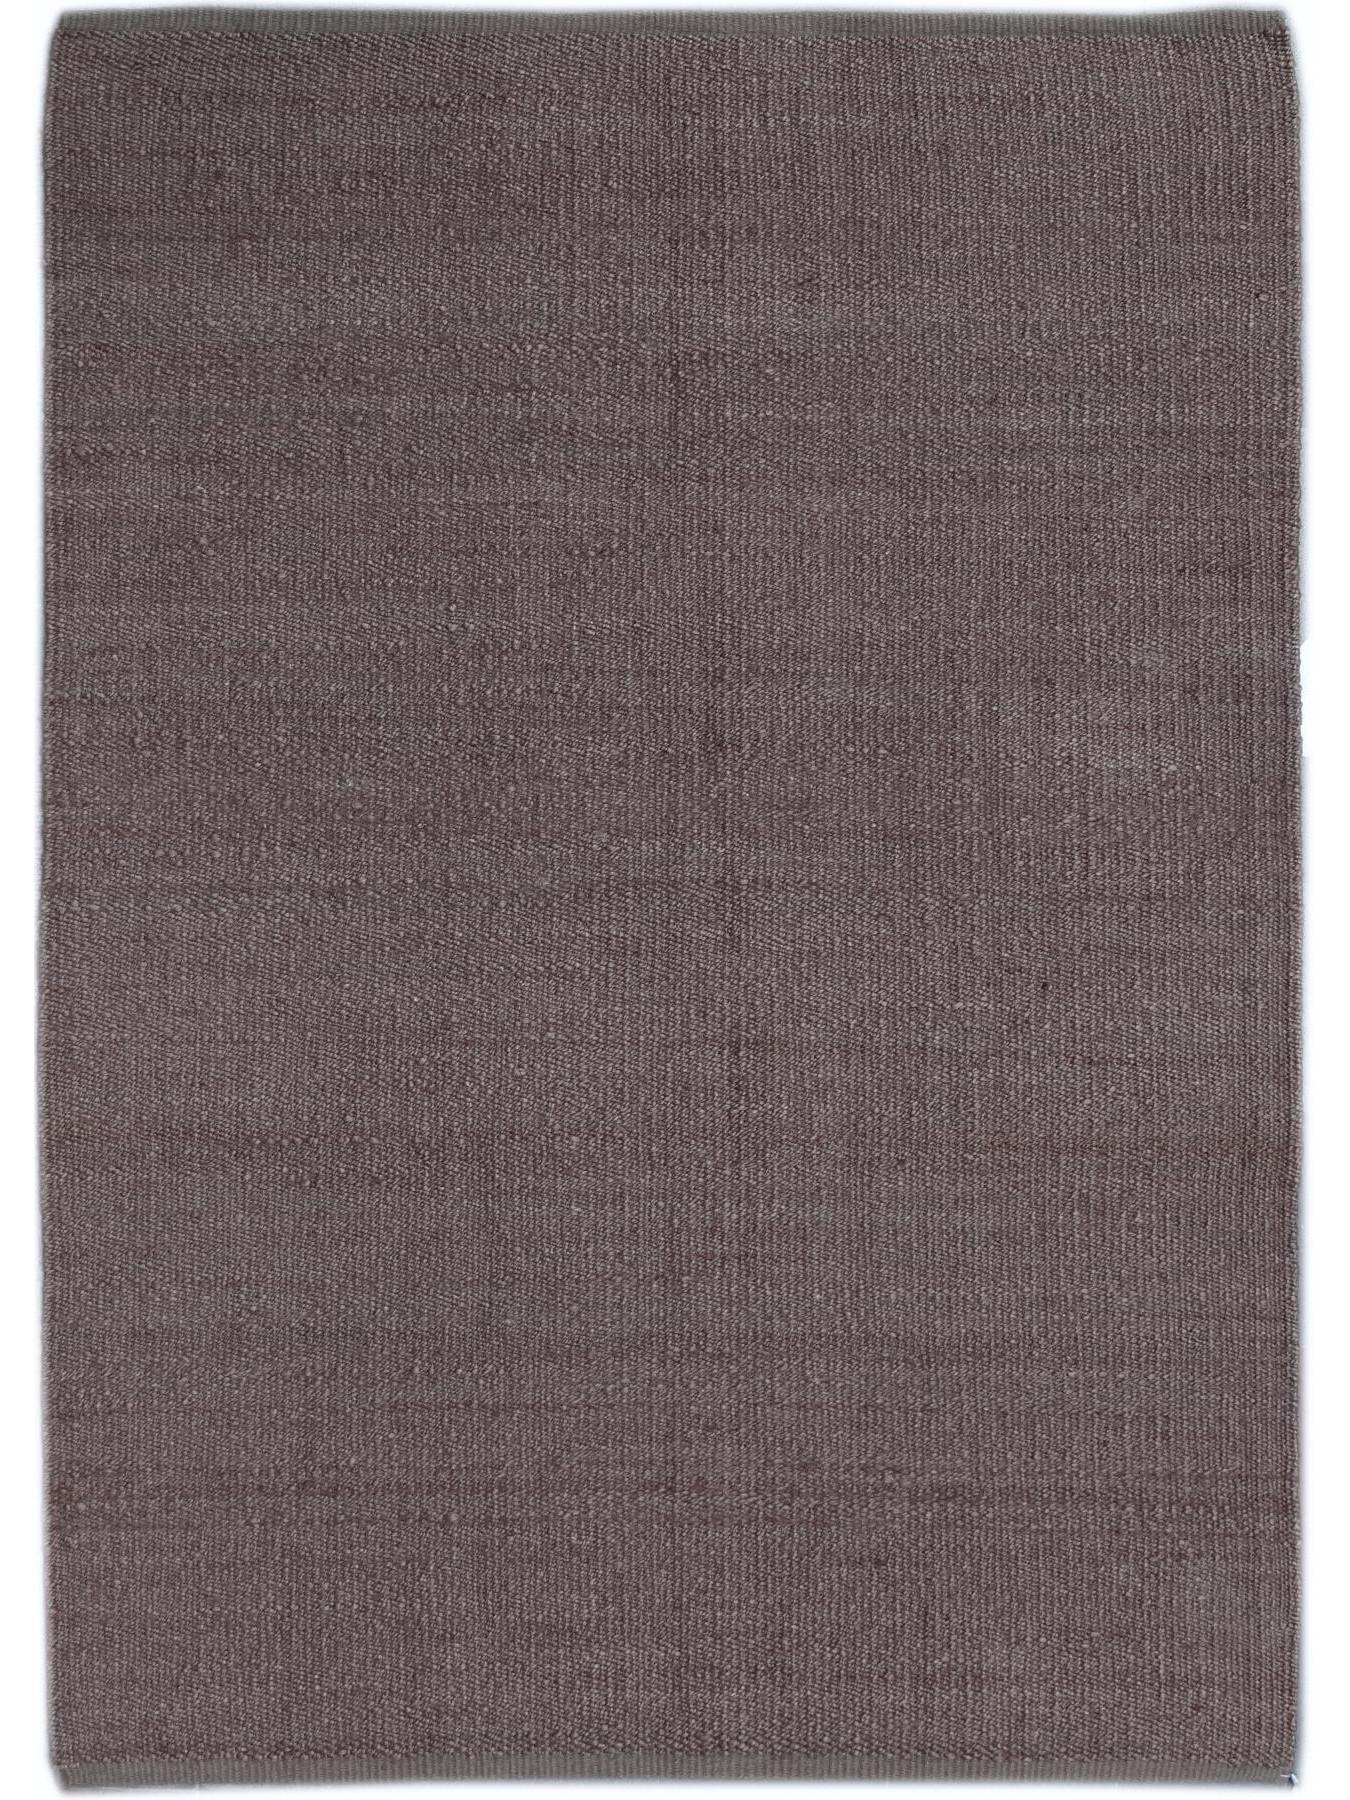 Modern kilims - CHANVRE 003 - 6006